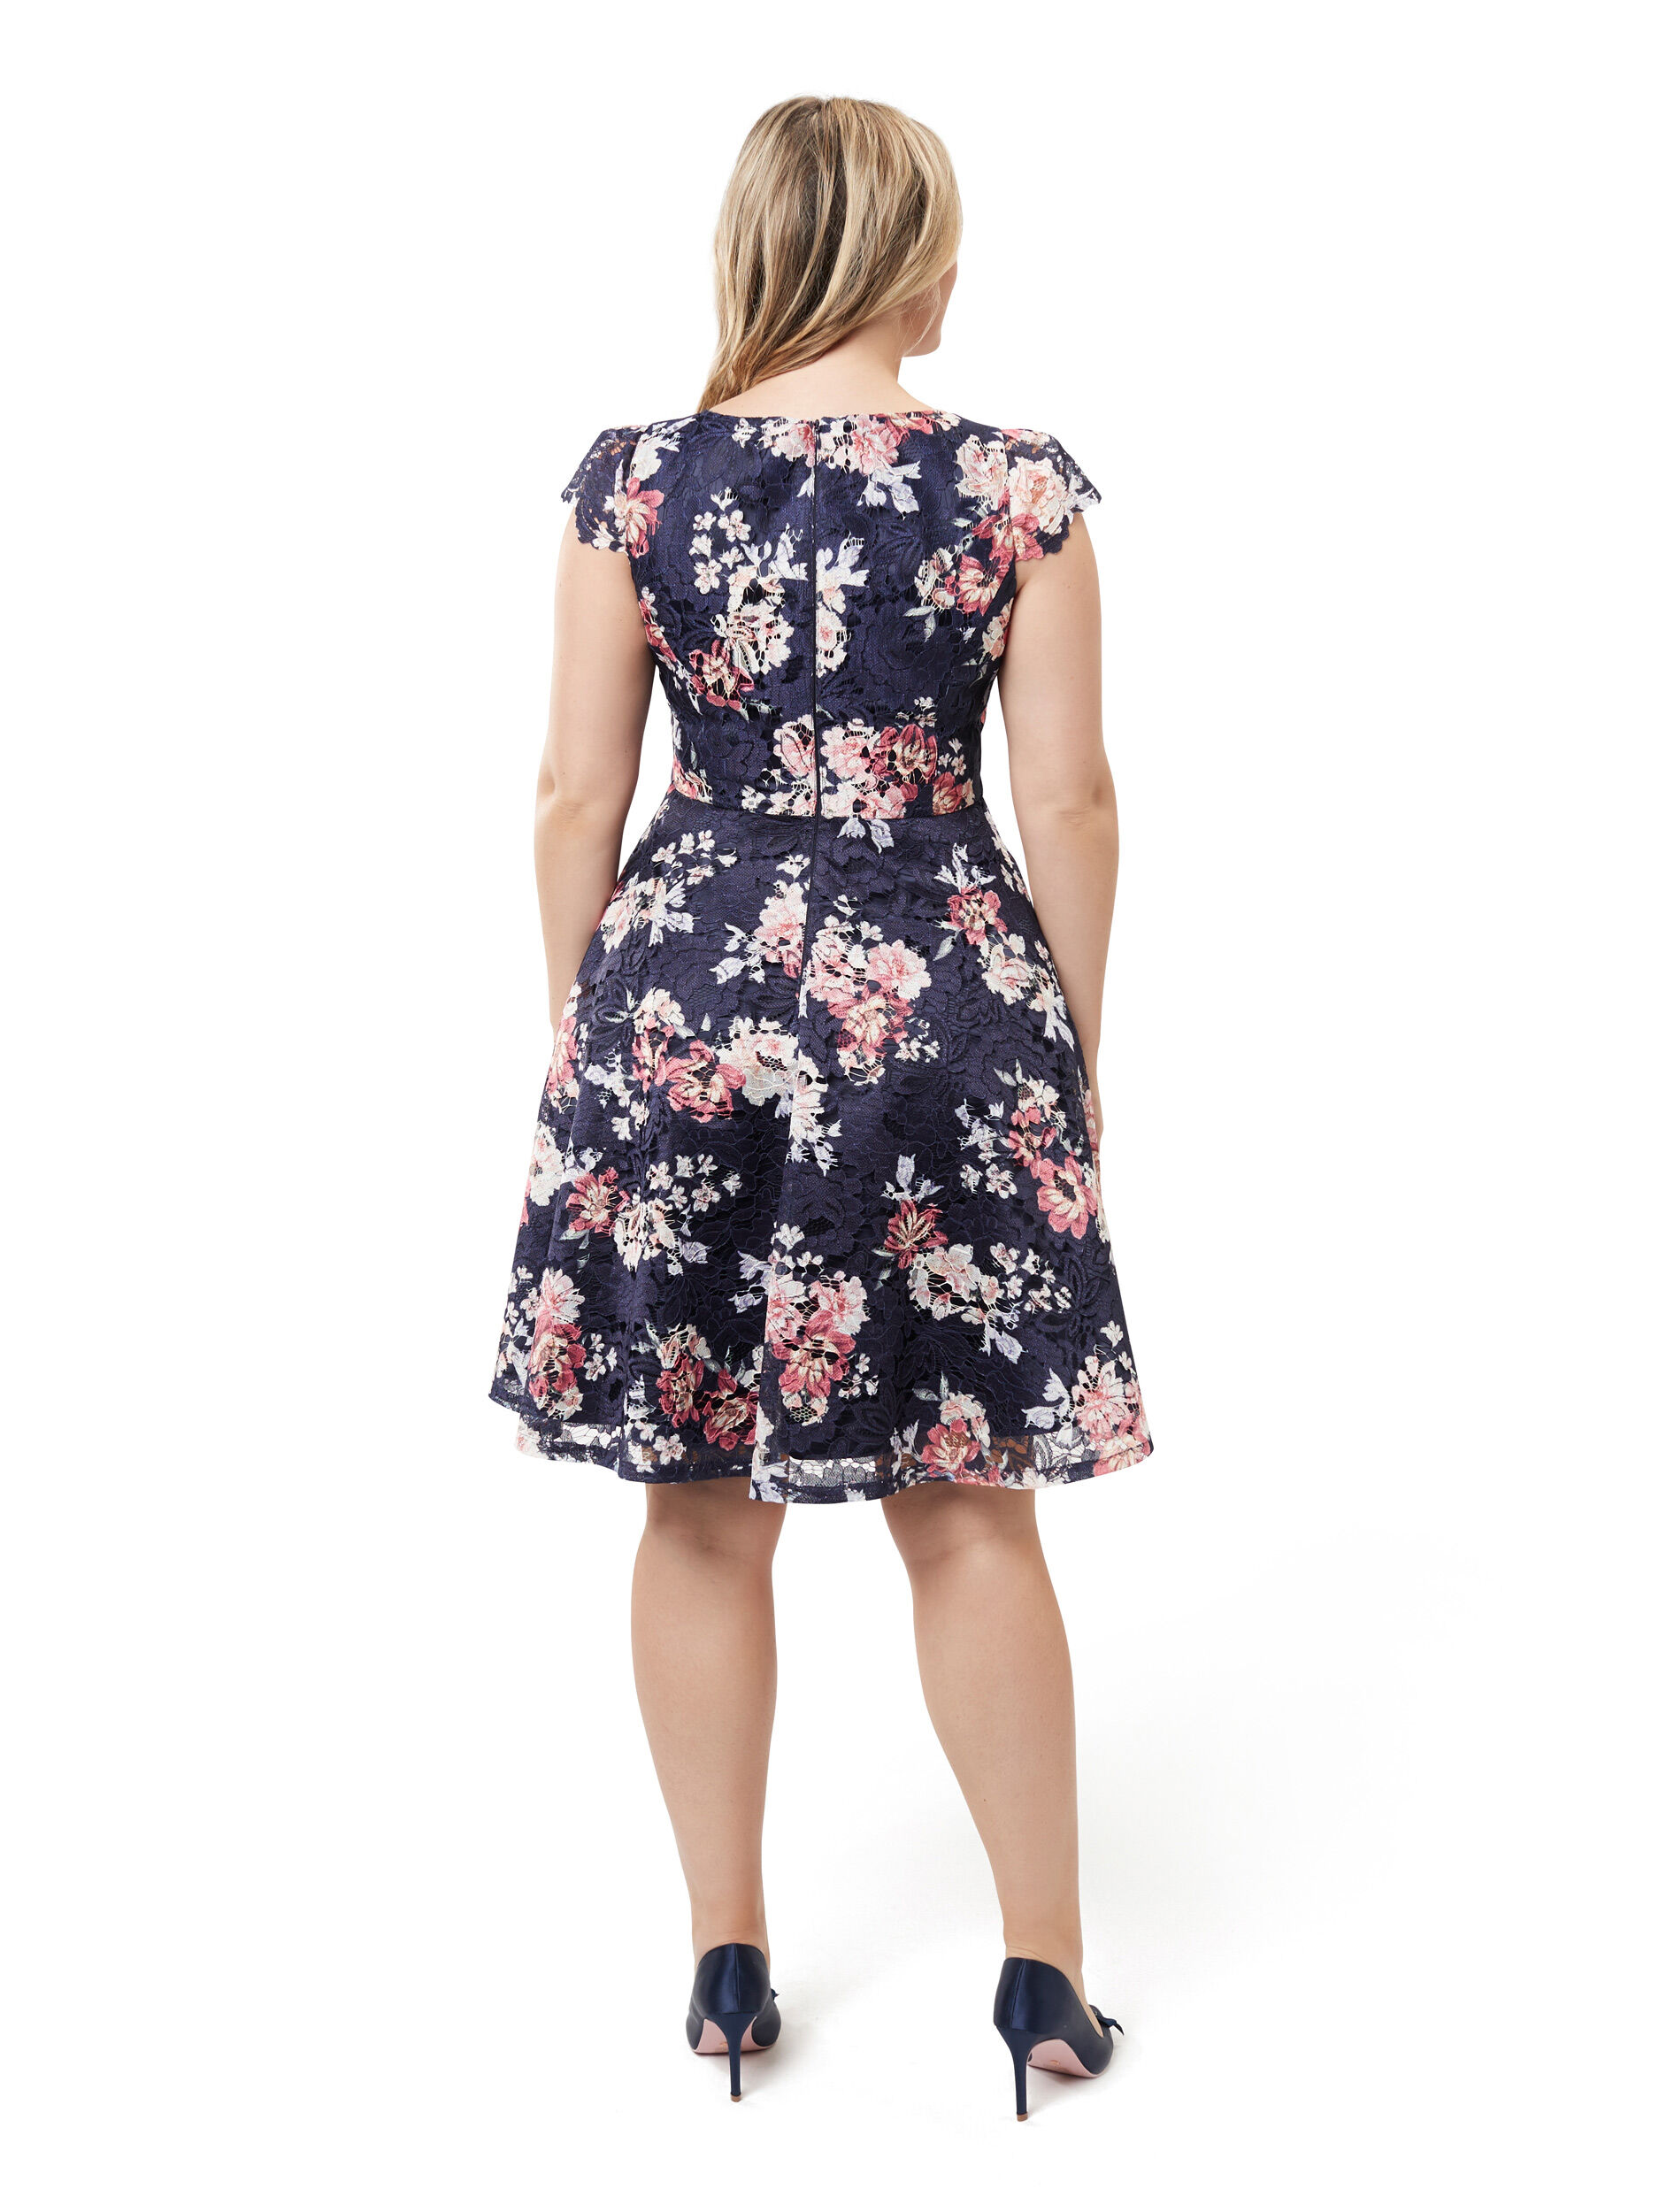 Radiance Blossom Dress